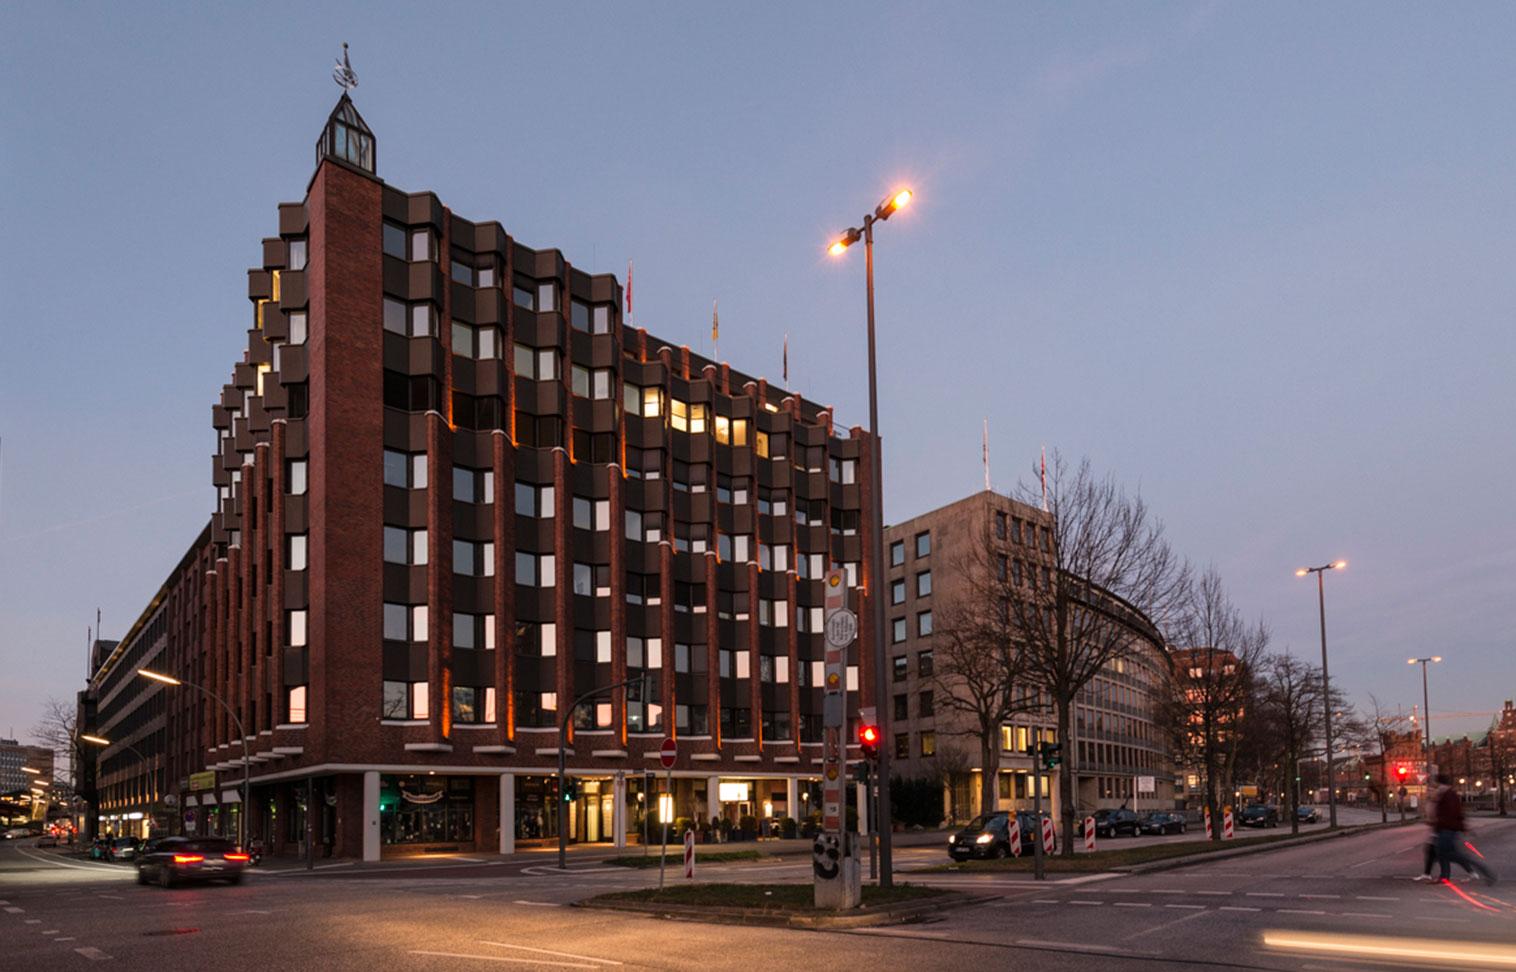 City Hotel Dammtor